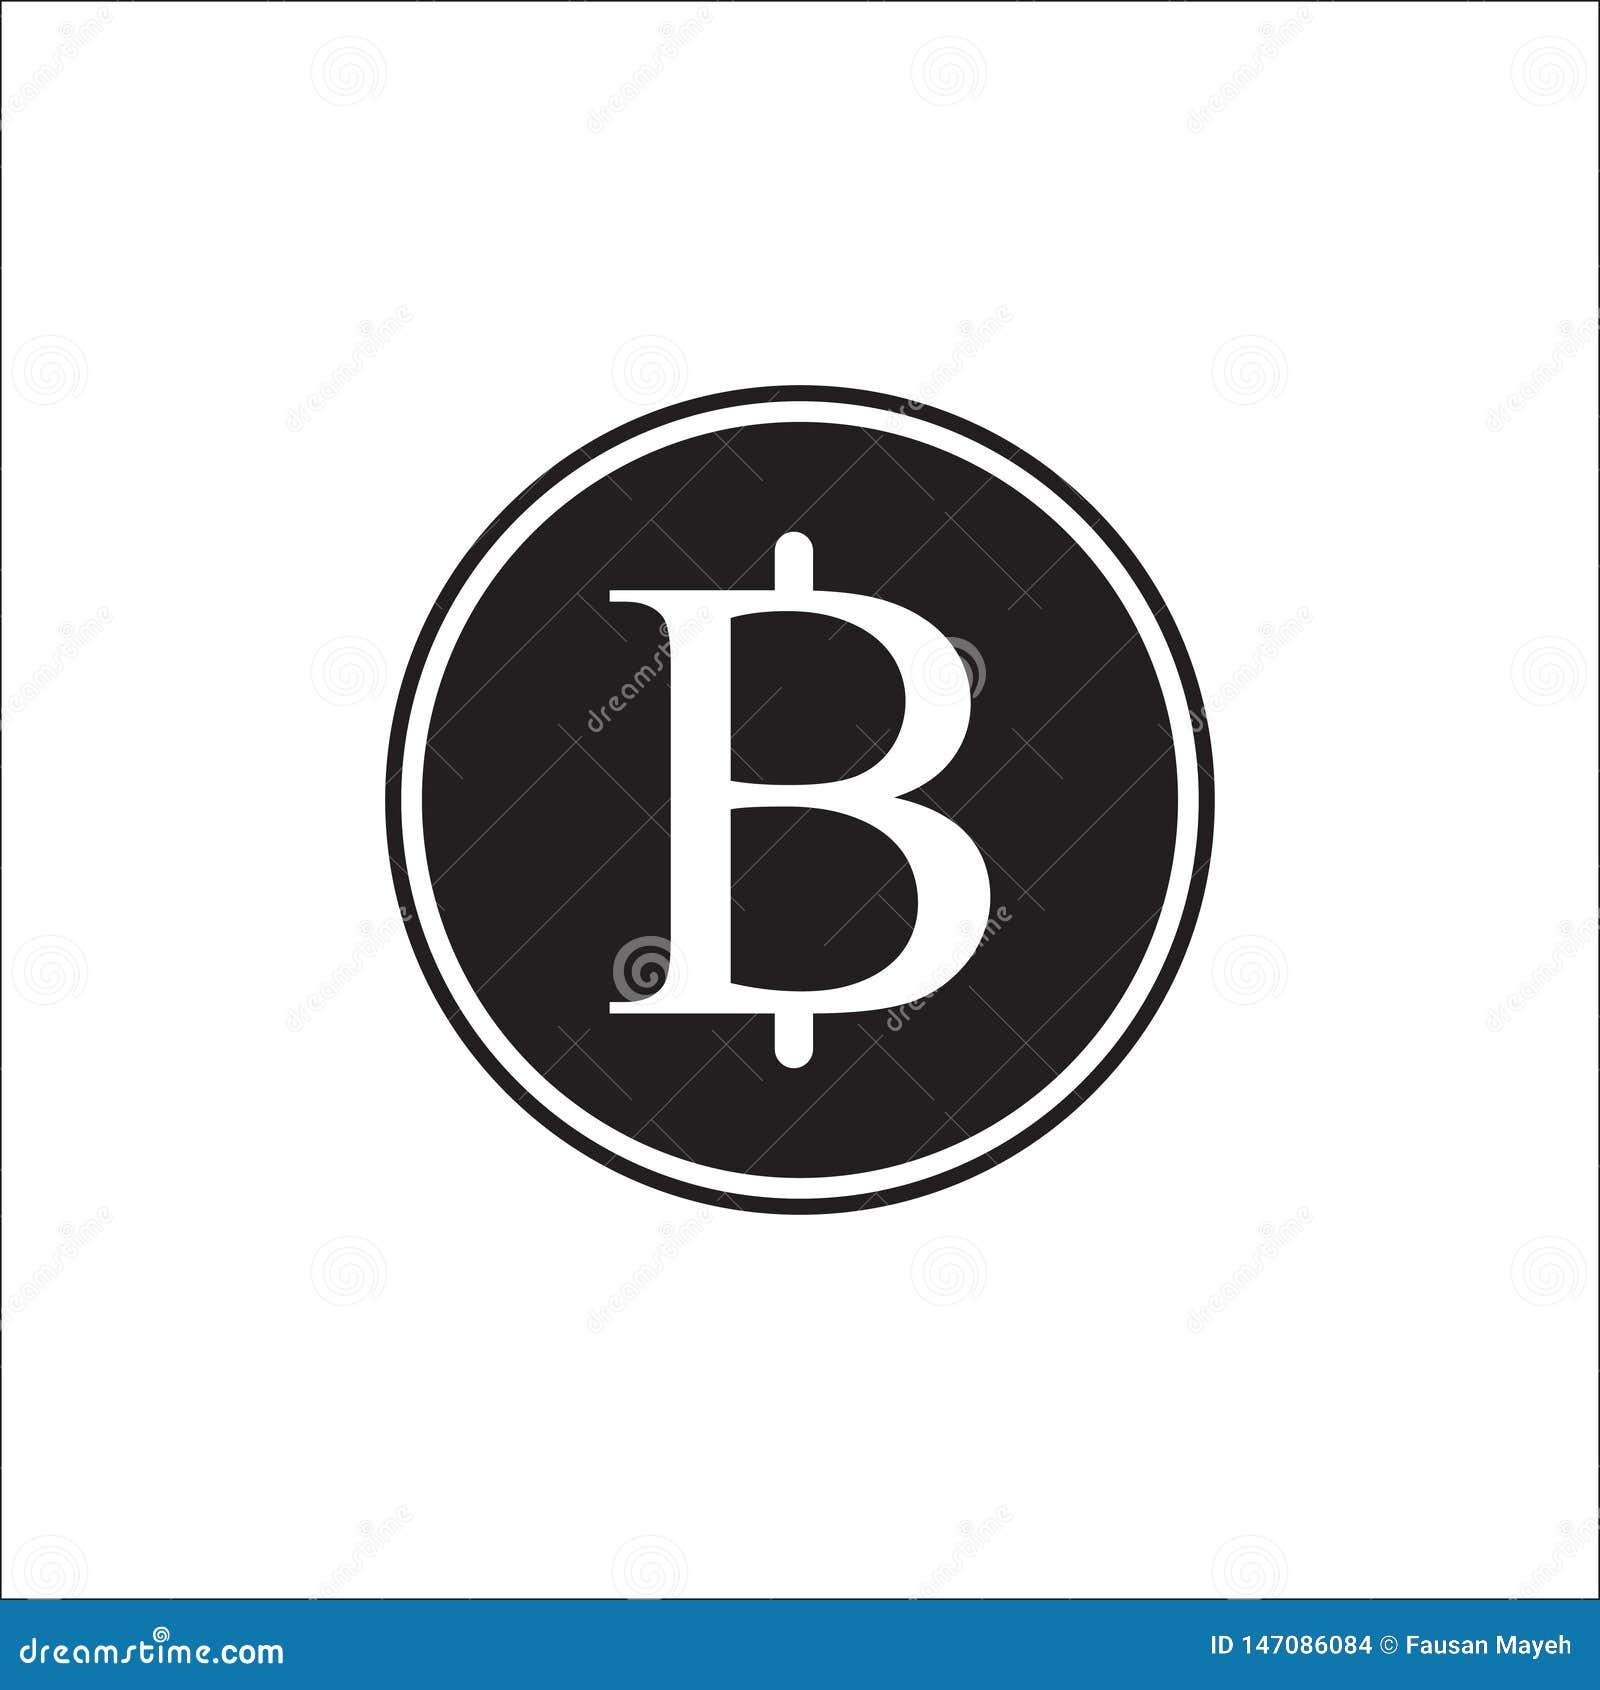 Иллюстрация логотипа, вектор Таиланда валюты знака тайского бата, вектор монетки бата